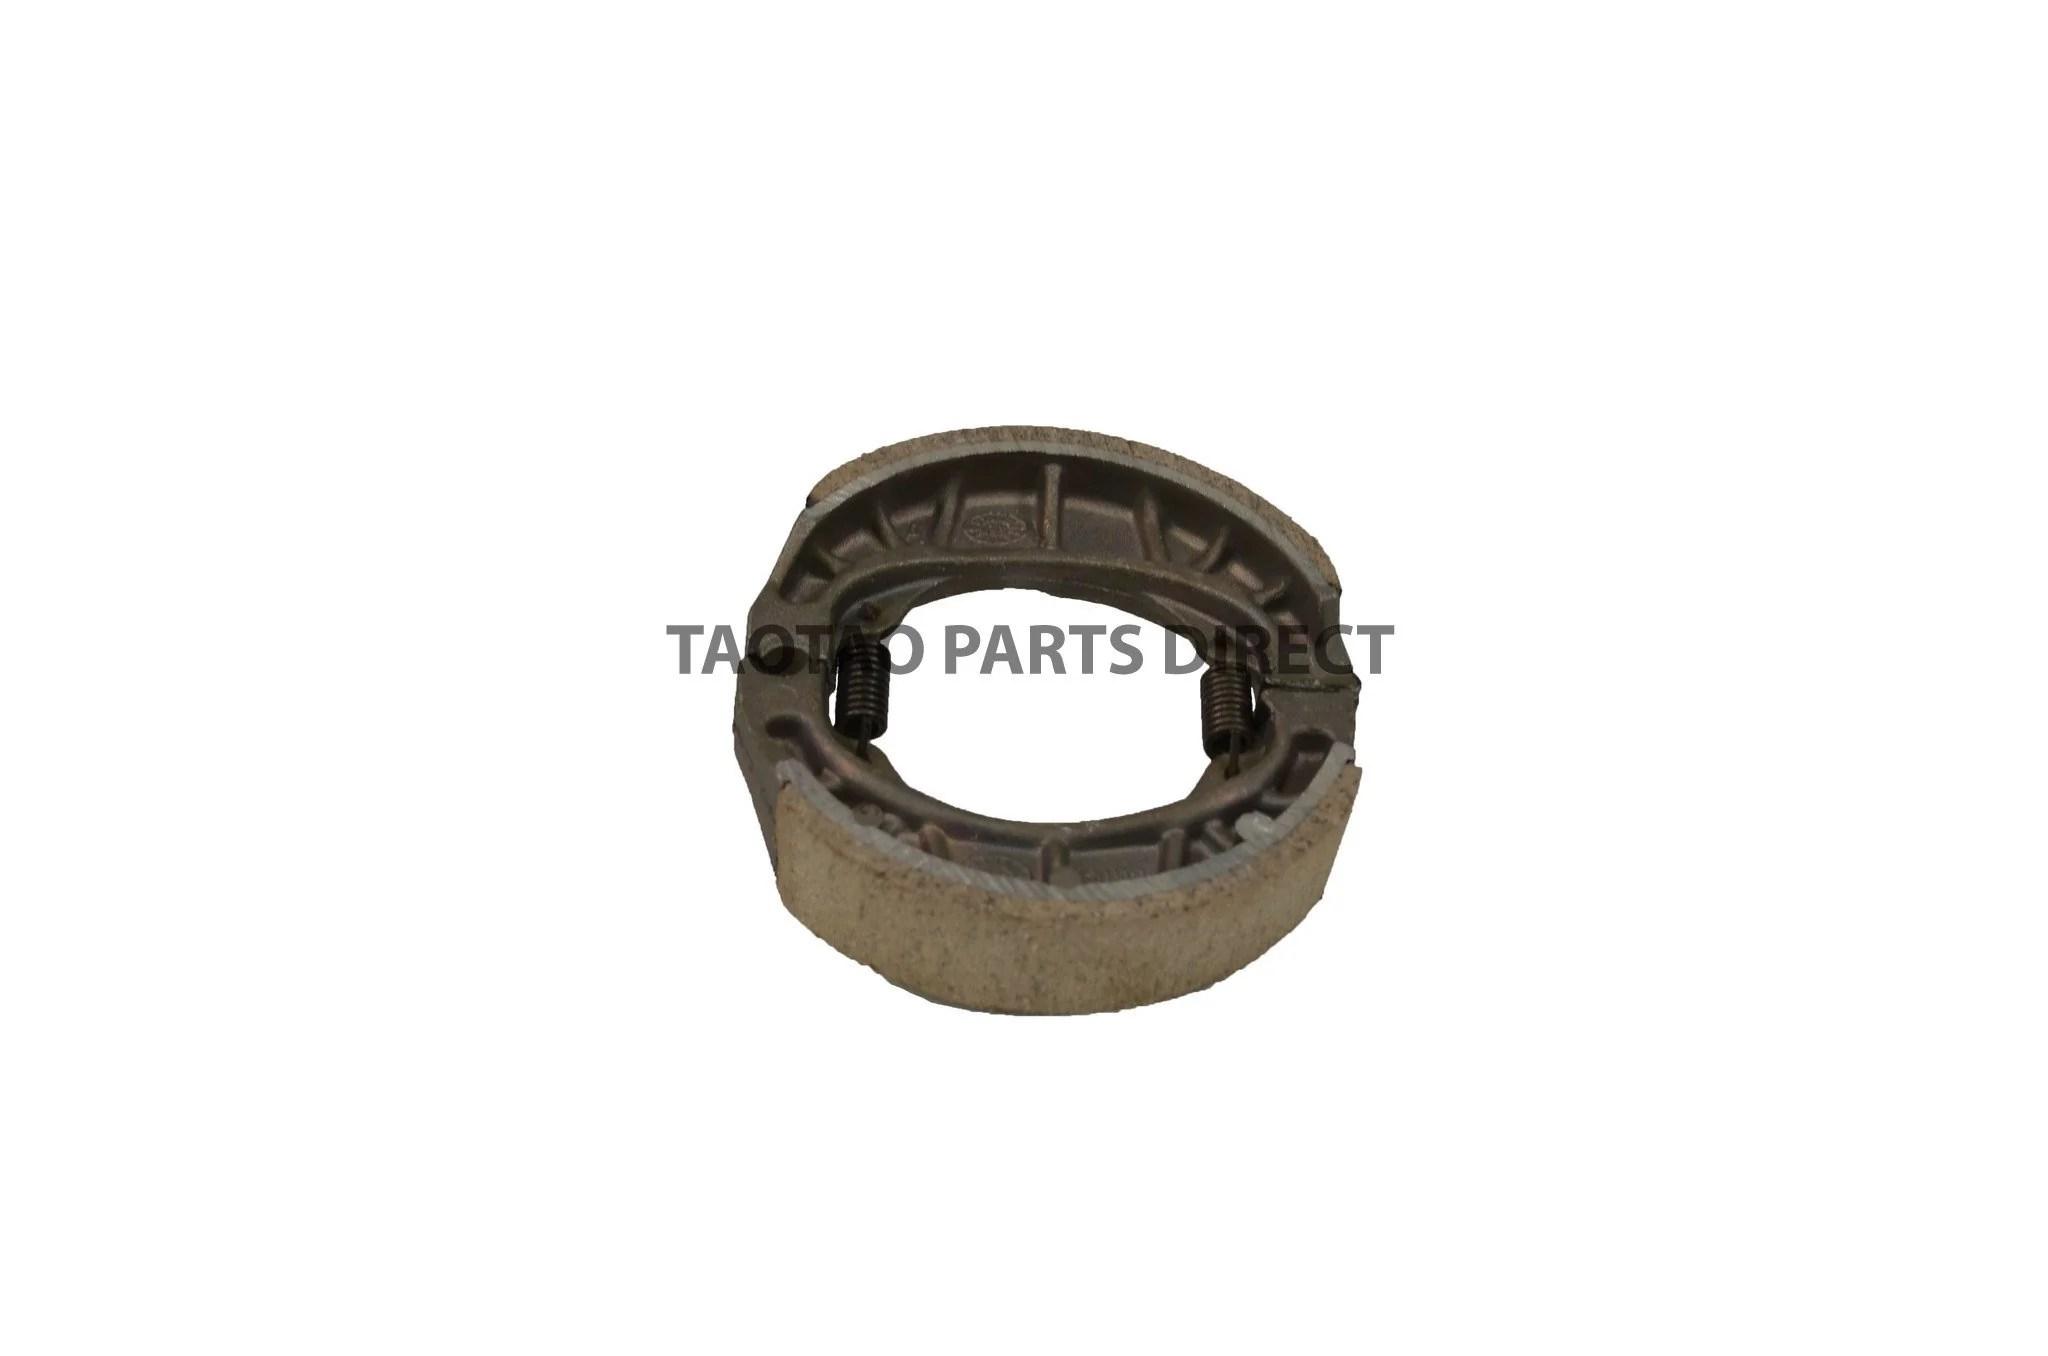 small resolution of 49cc brake shoes taotaopartsdirect com